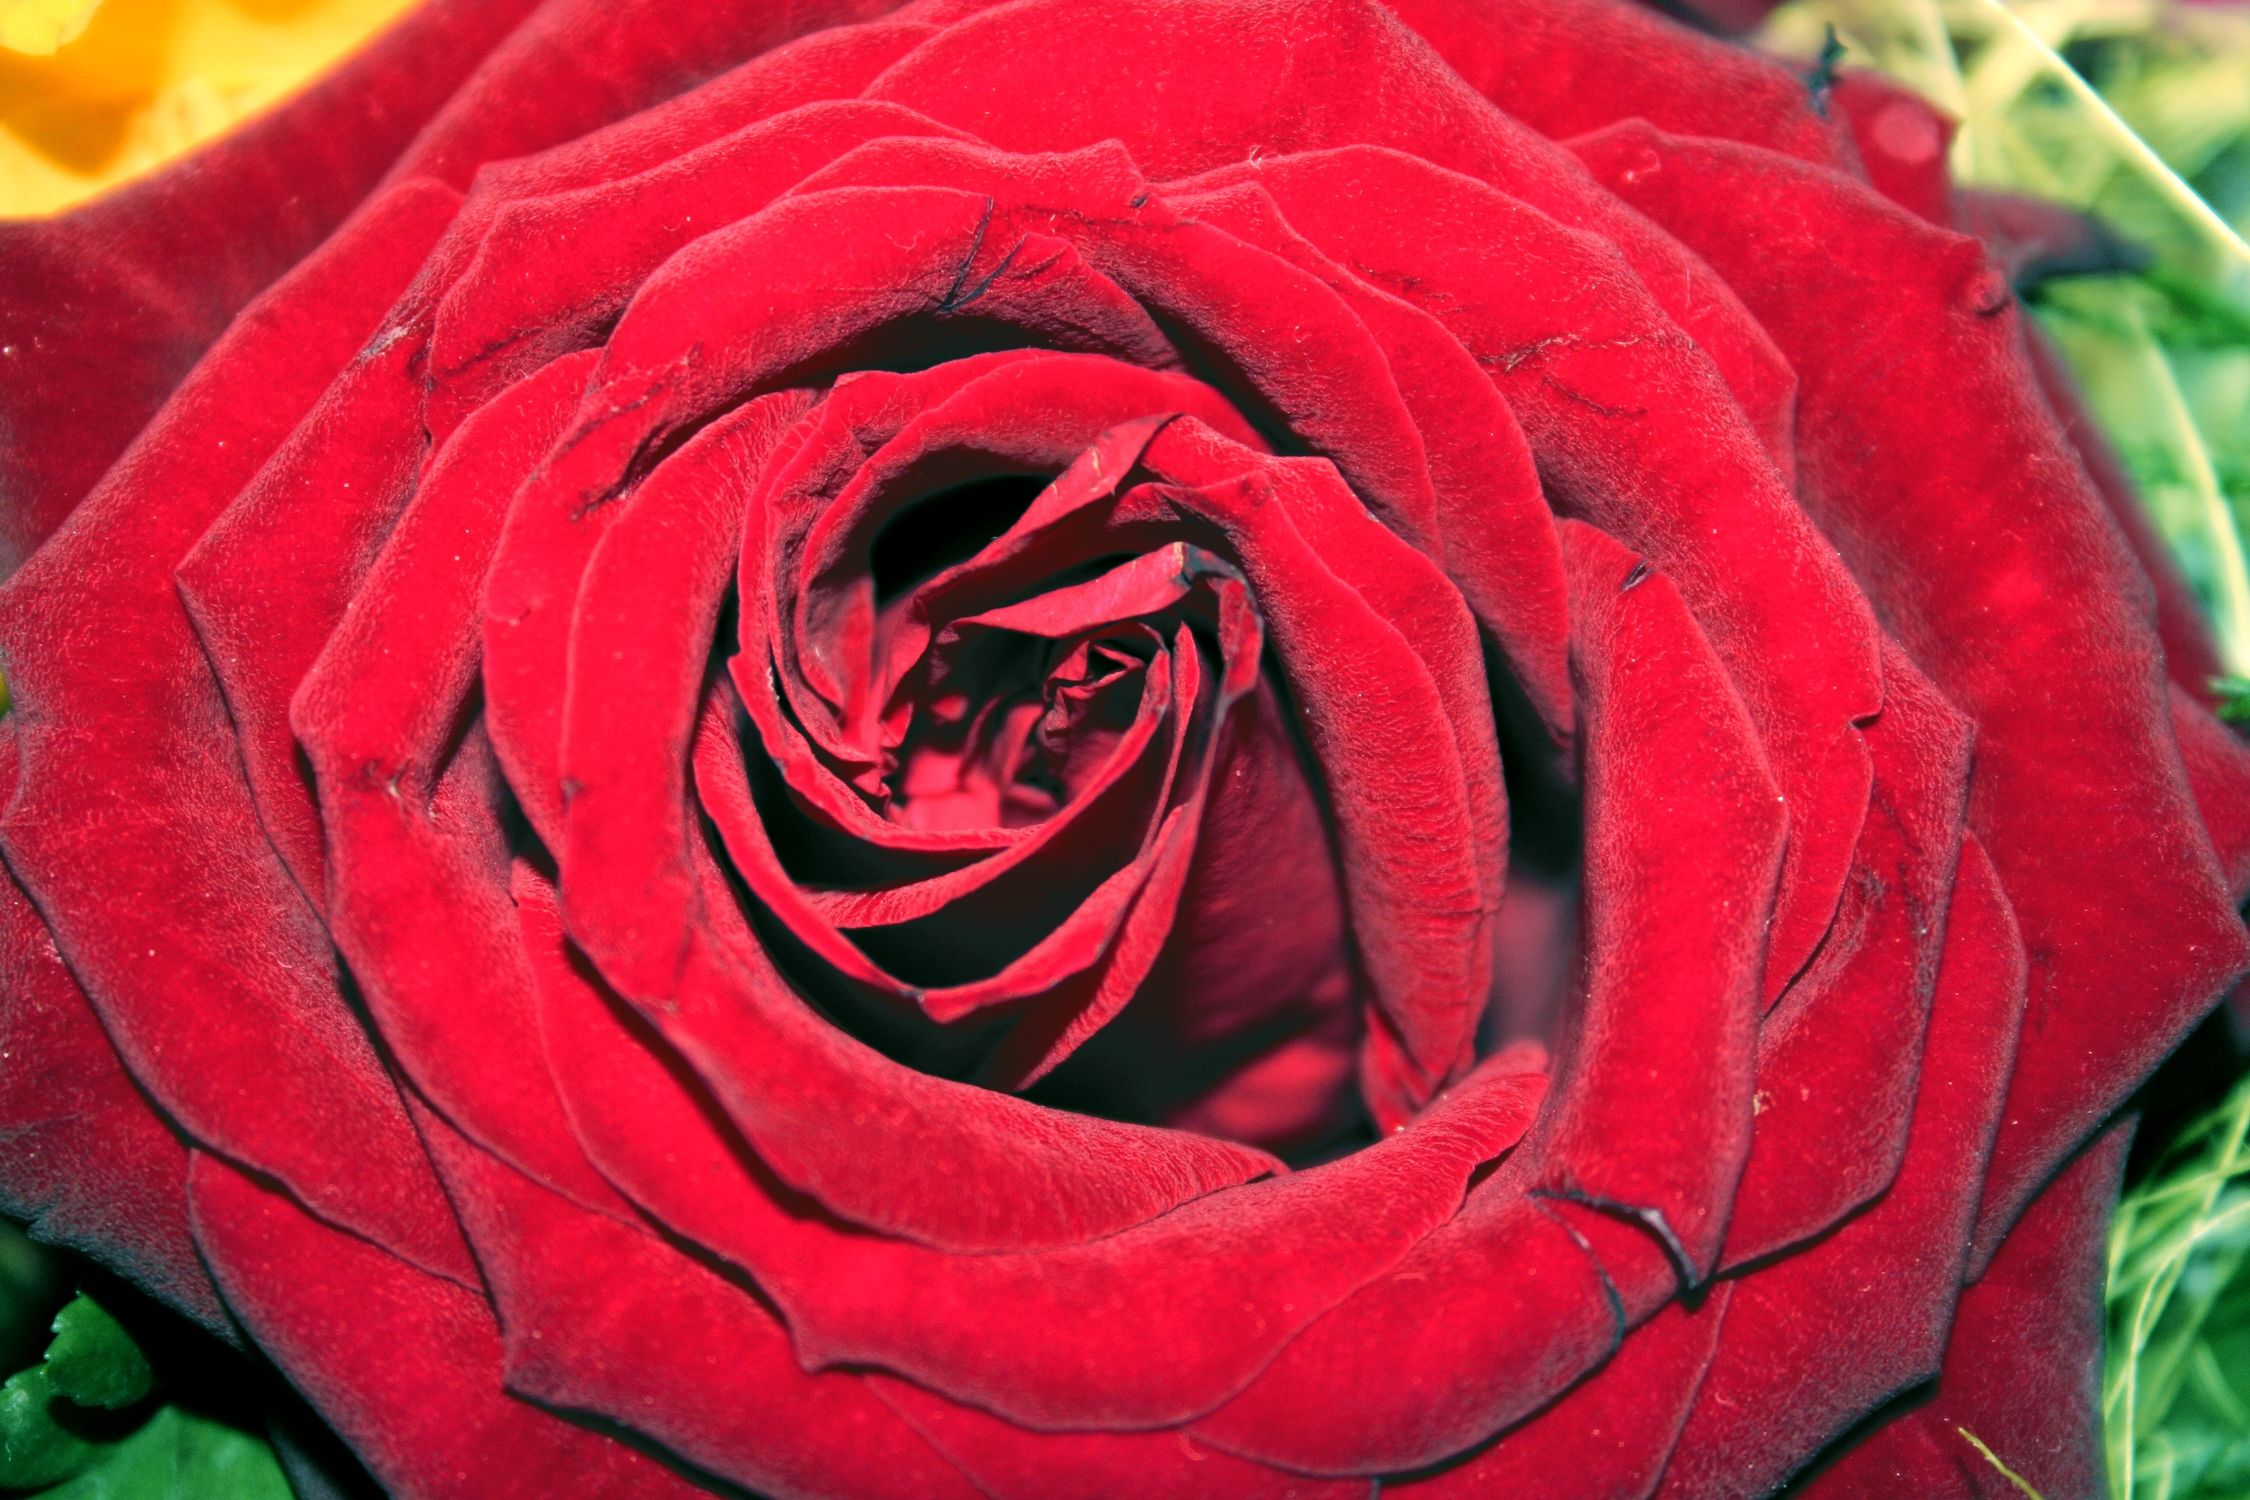 Bild mit Farben, Natur, Pflanzen, Blumen, Blumen, Rosa, Rot, Rot, Rosen, Blume, Pflanze, Rose, Roses, rote Rose, Rosenblüte, Flower, Flowers, osaceae, red